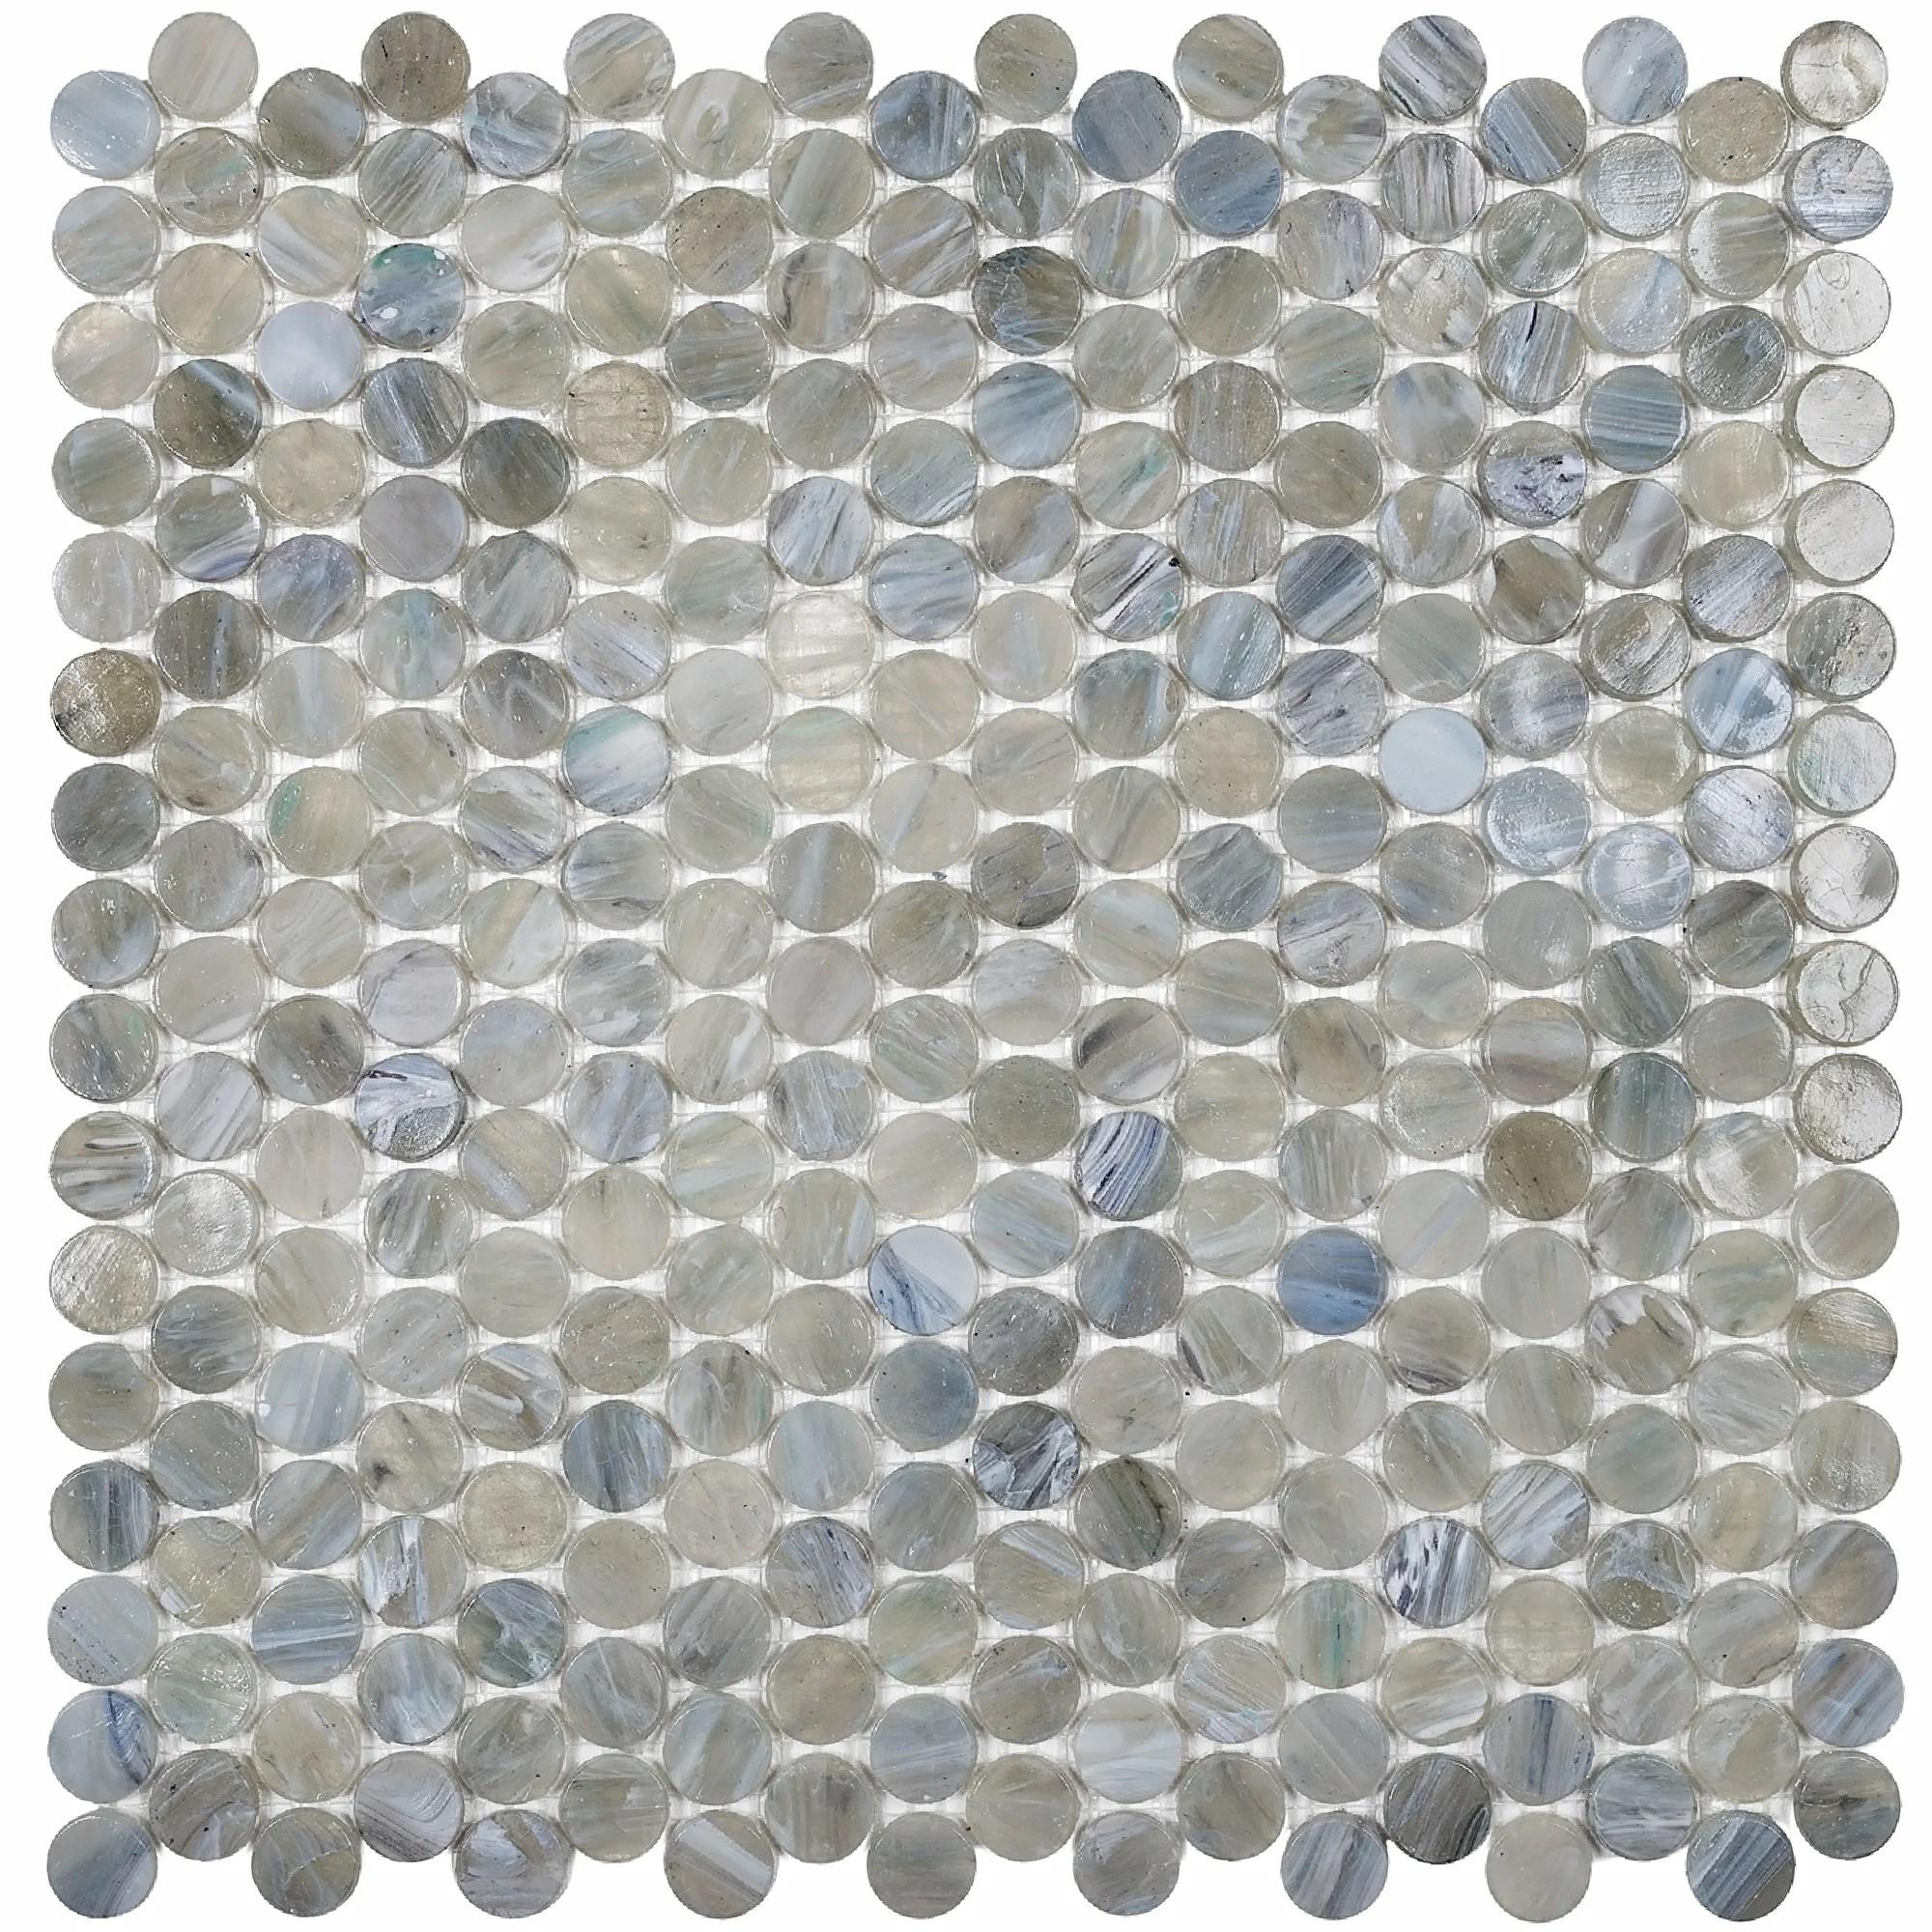 apollo tile backsplash tiles sheet 12 2x12 2 glass tile for kitchen bathroom flooring blue ocean mix penny round mosaic shadow grey 10 pack